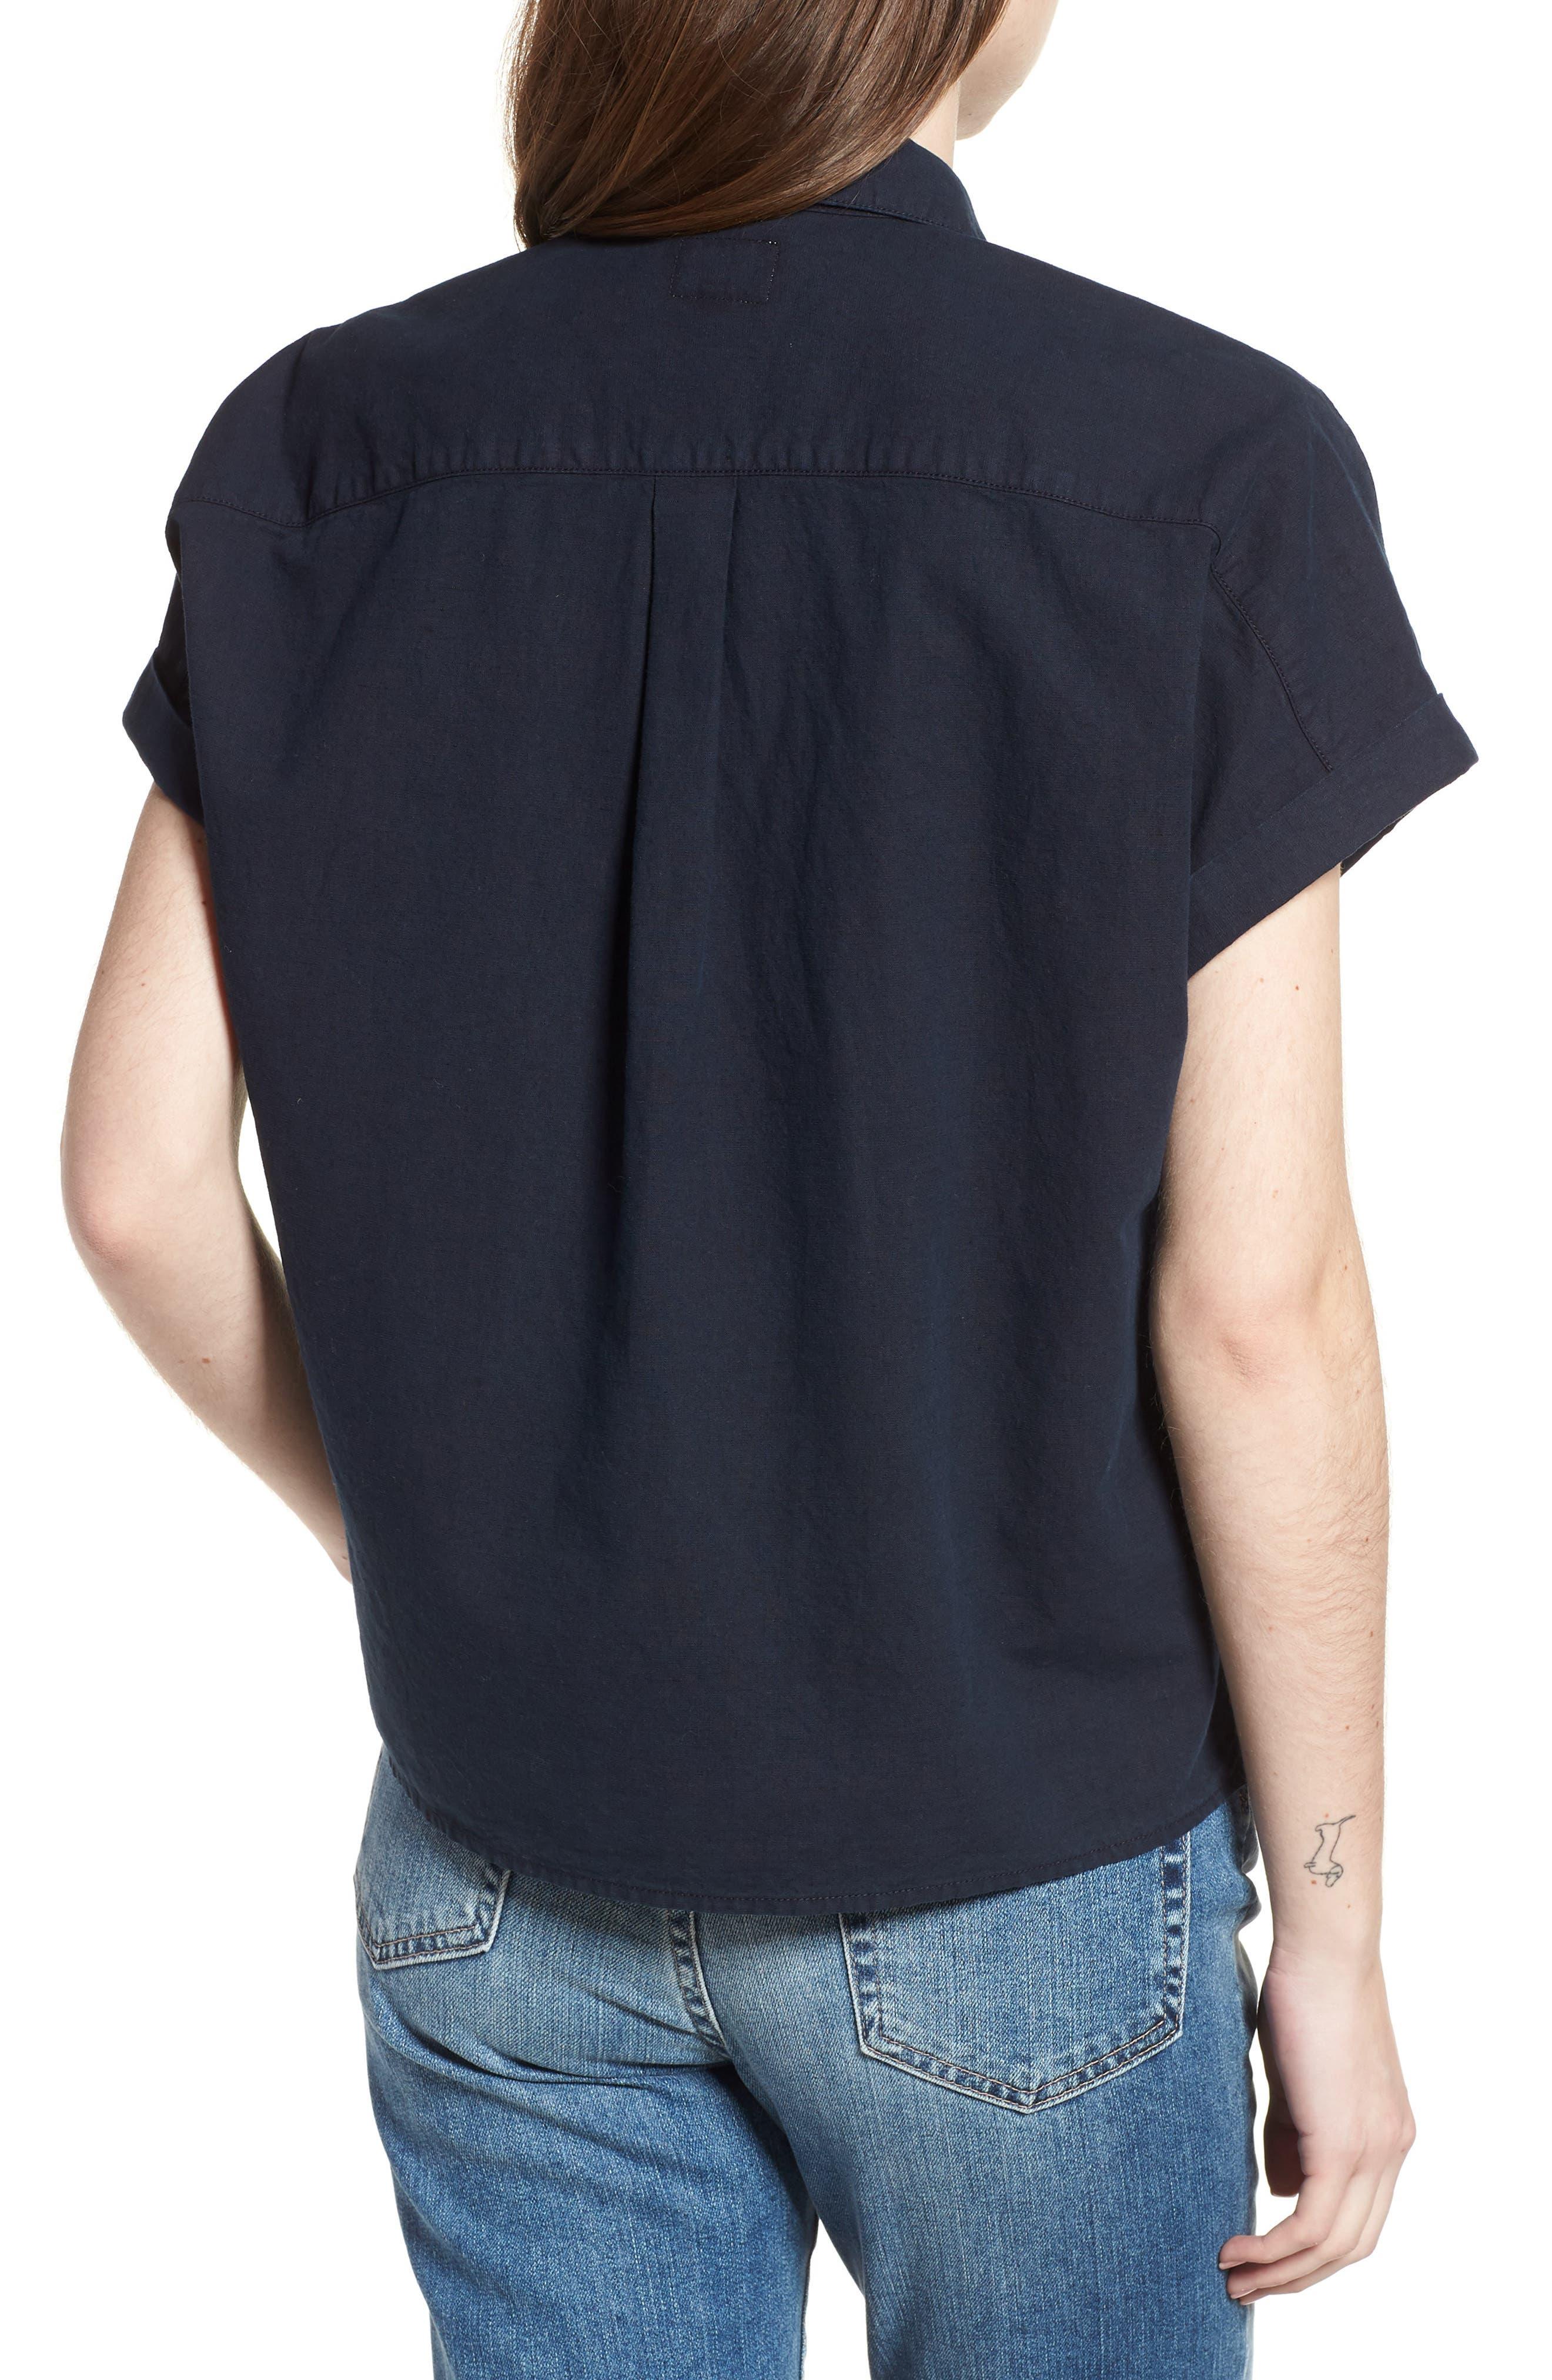 Hadley Shirt,                             Alternate thumbnail 2, color,                             SULFUR DARK COVE